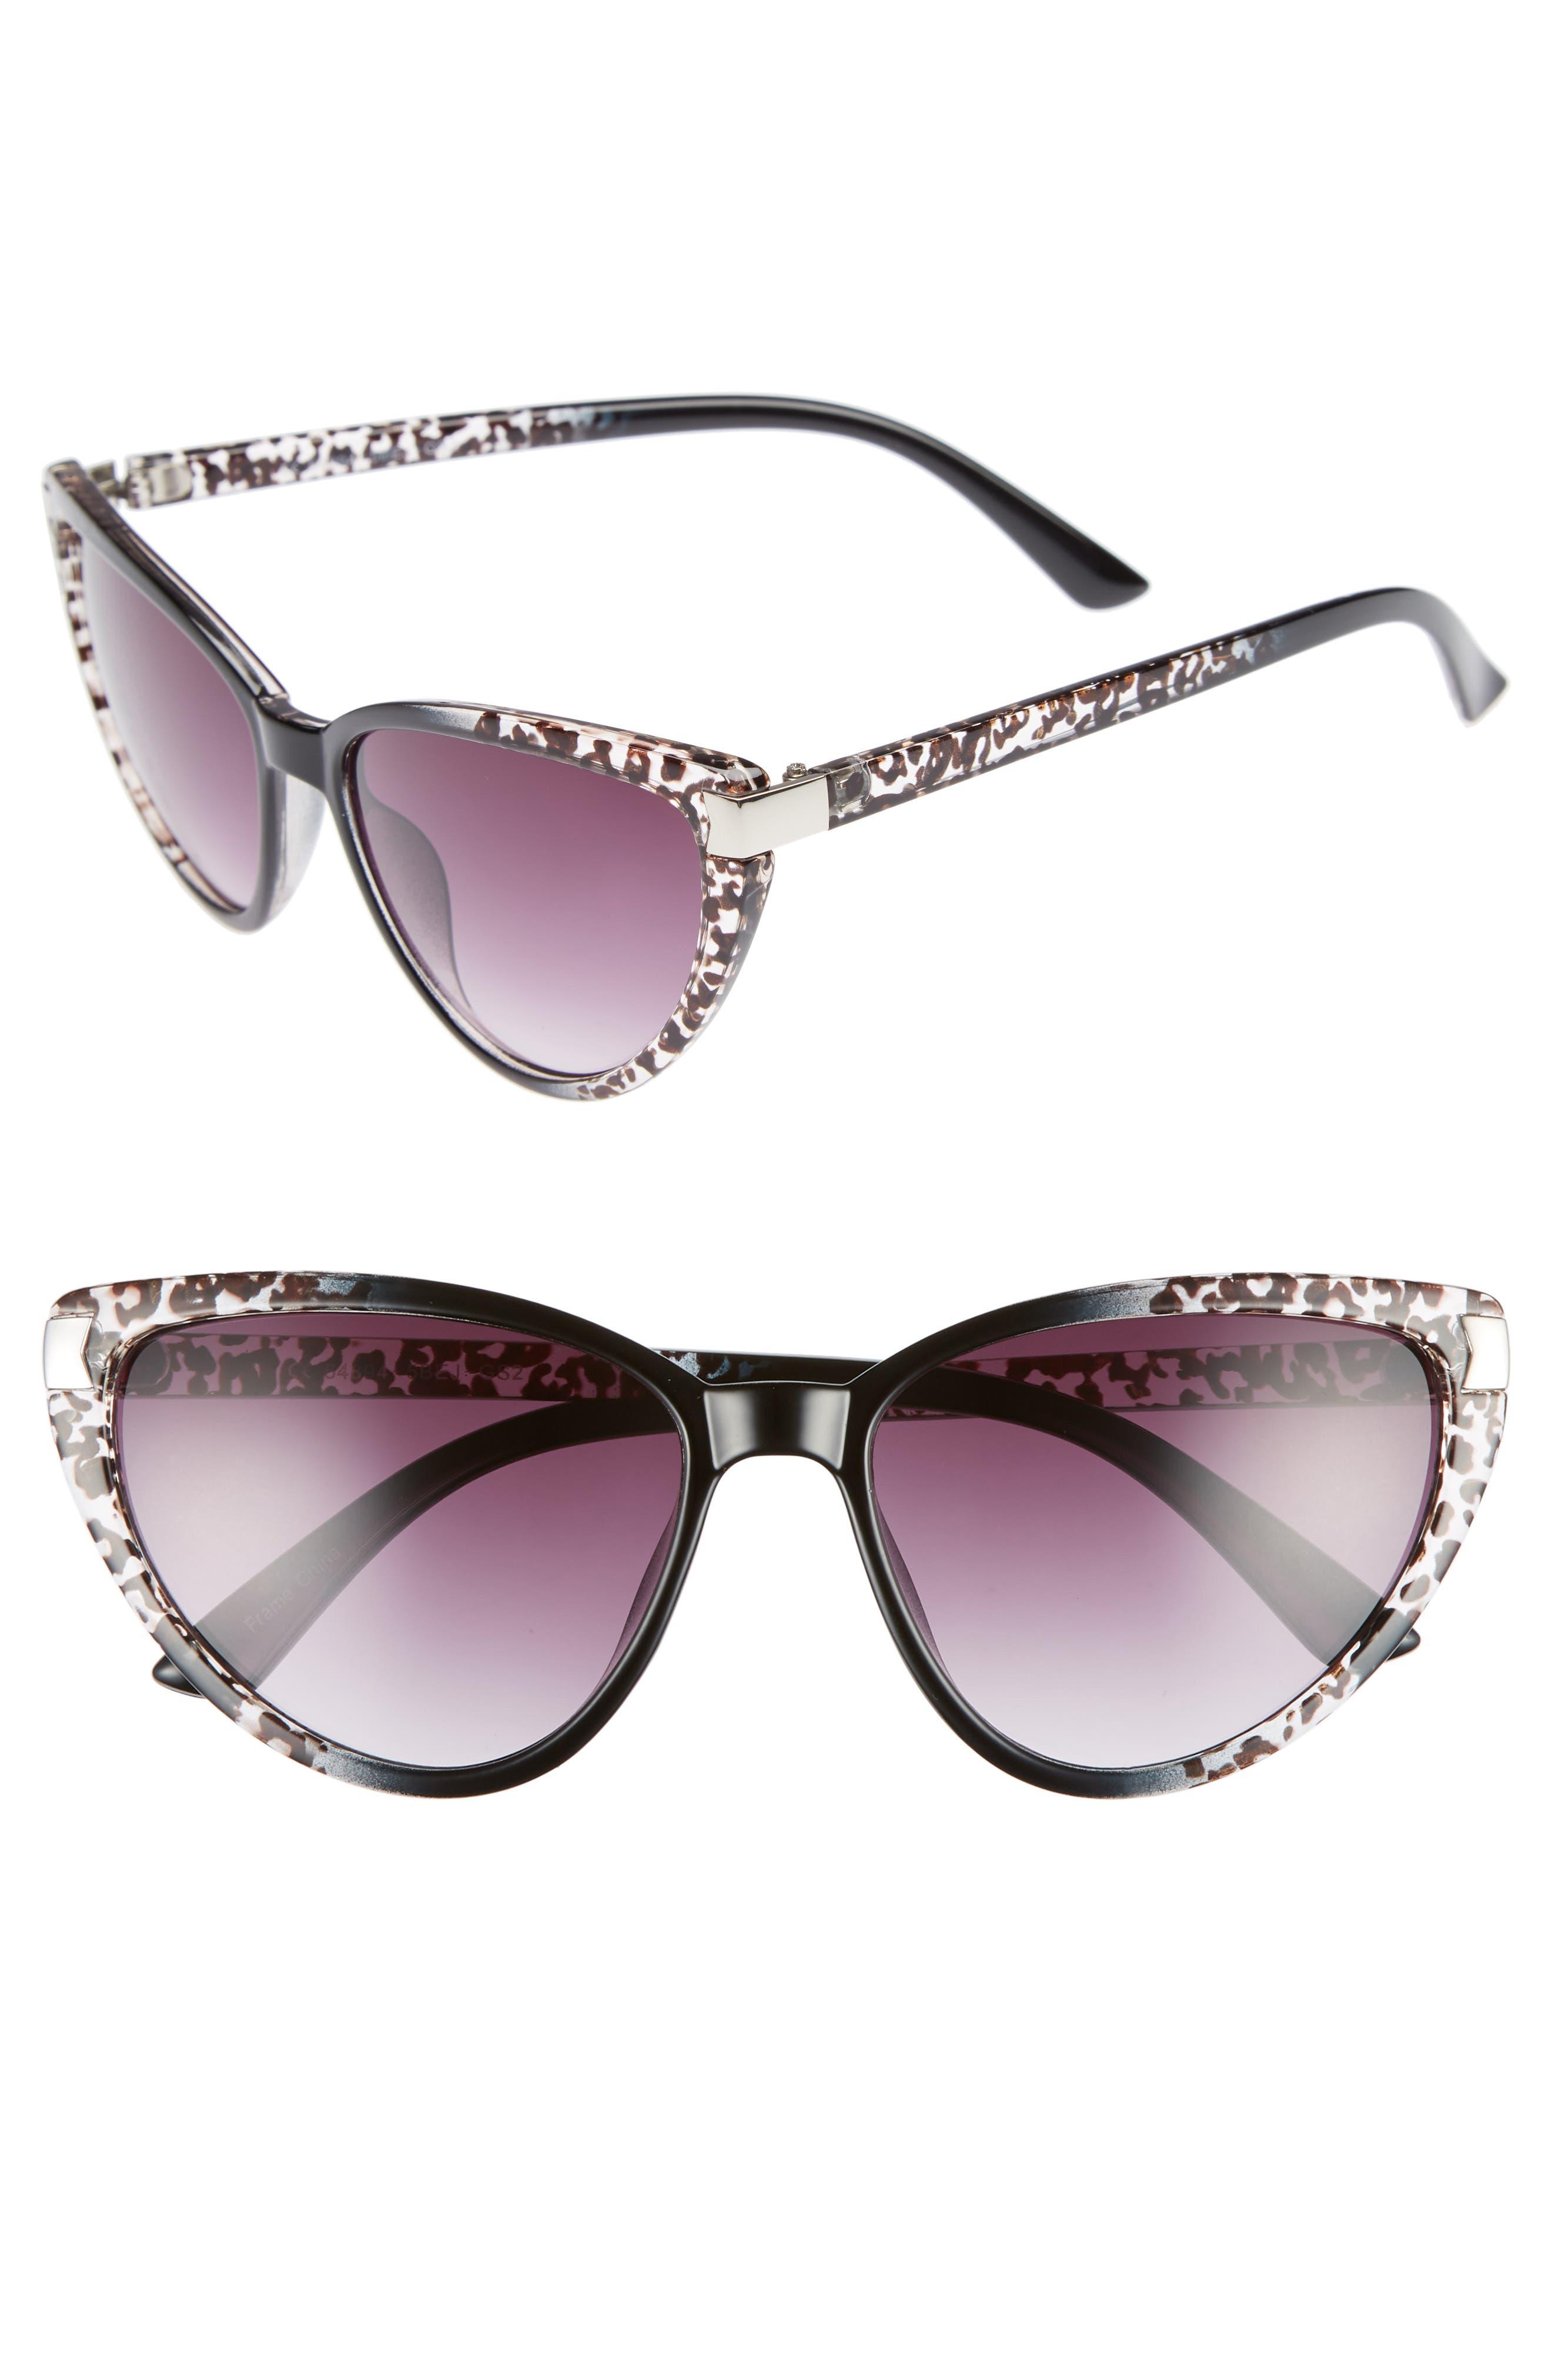 GLANCE EYEWEAR 57mm Spotted Cat Eye Sunglasses, Main, color, 001